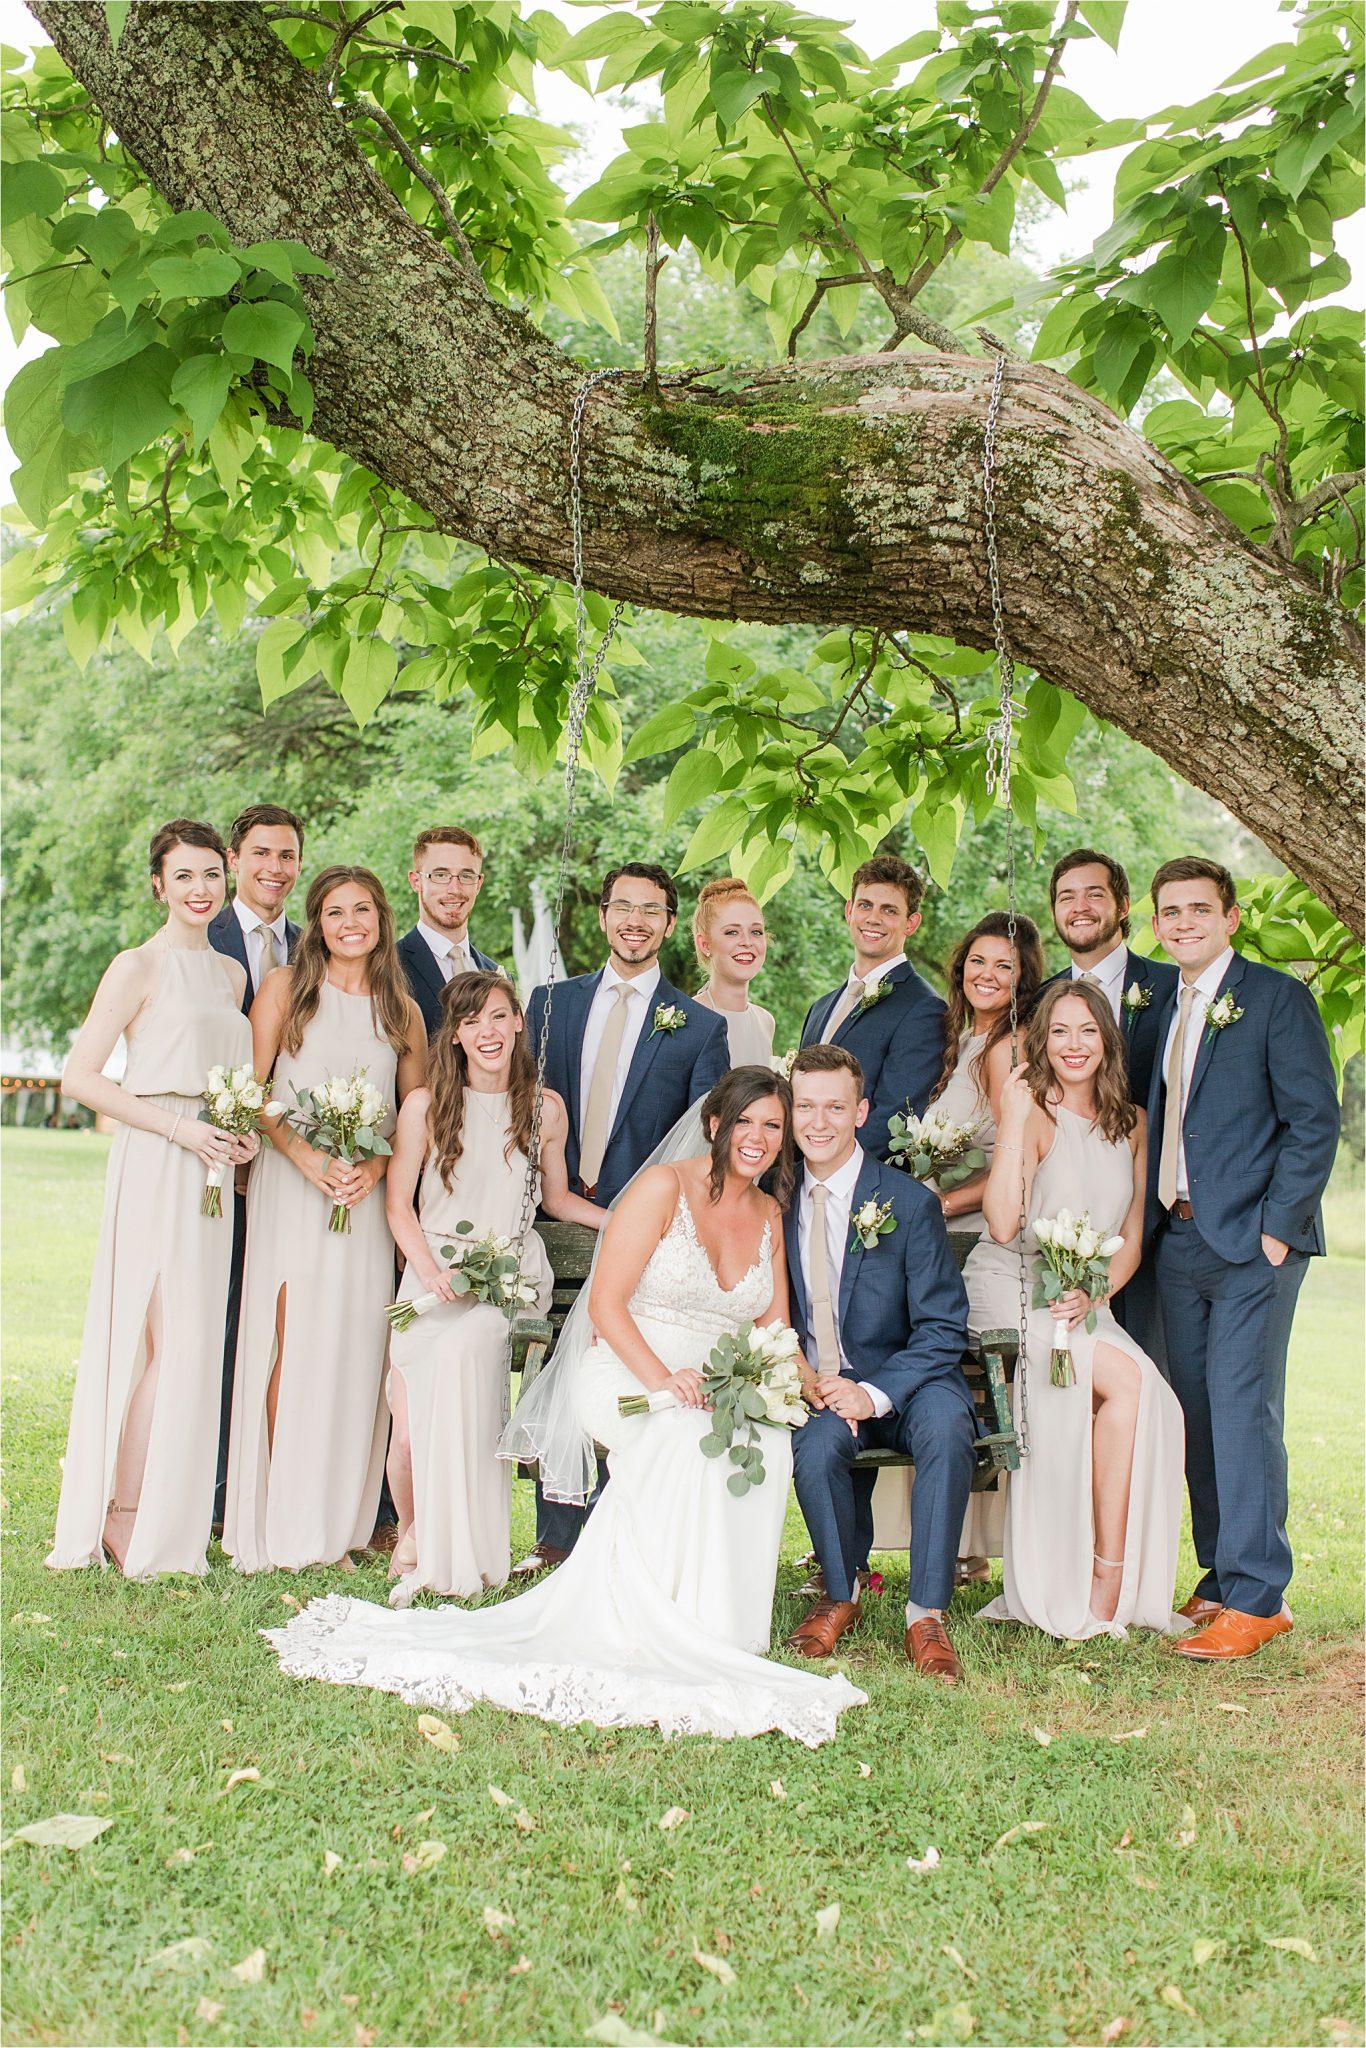 Hedge Farm Wedding, Alabama Wedding Photographer, Barn Wedding, navy and neutral themed wedding, wedding party